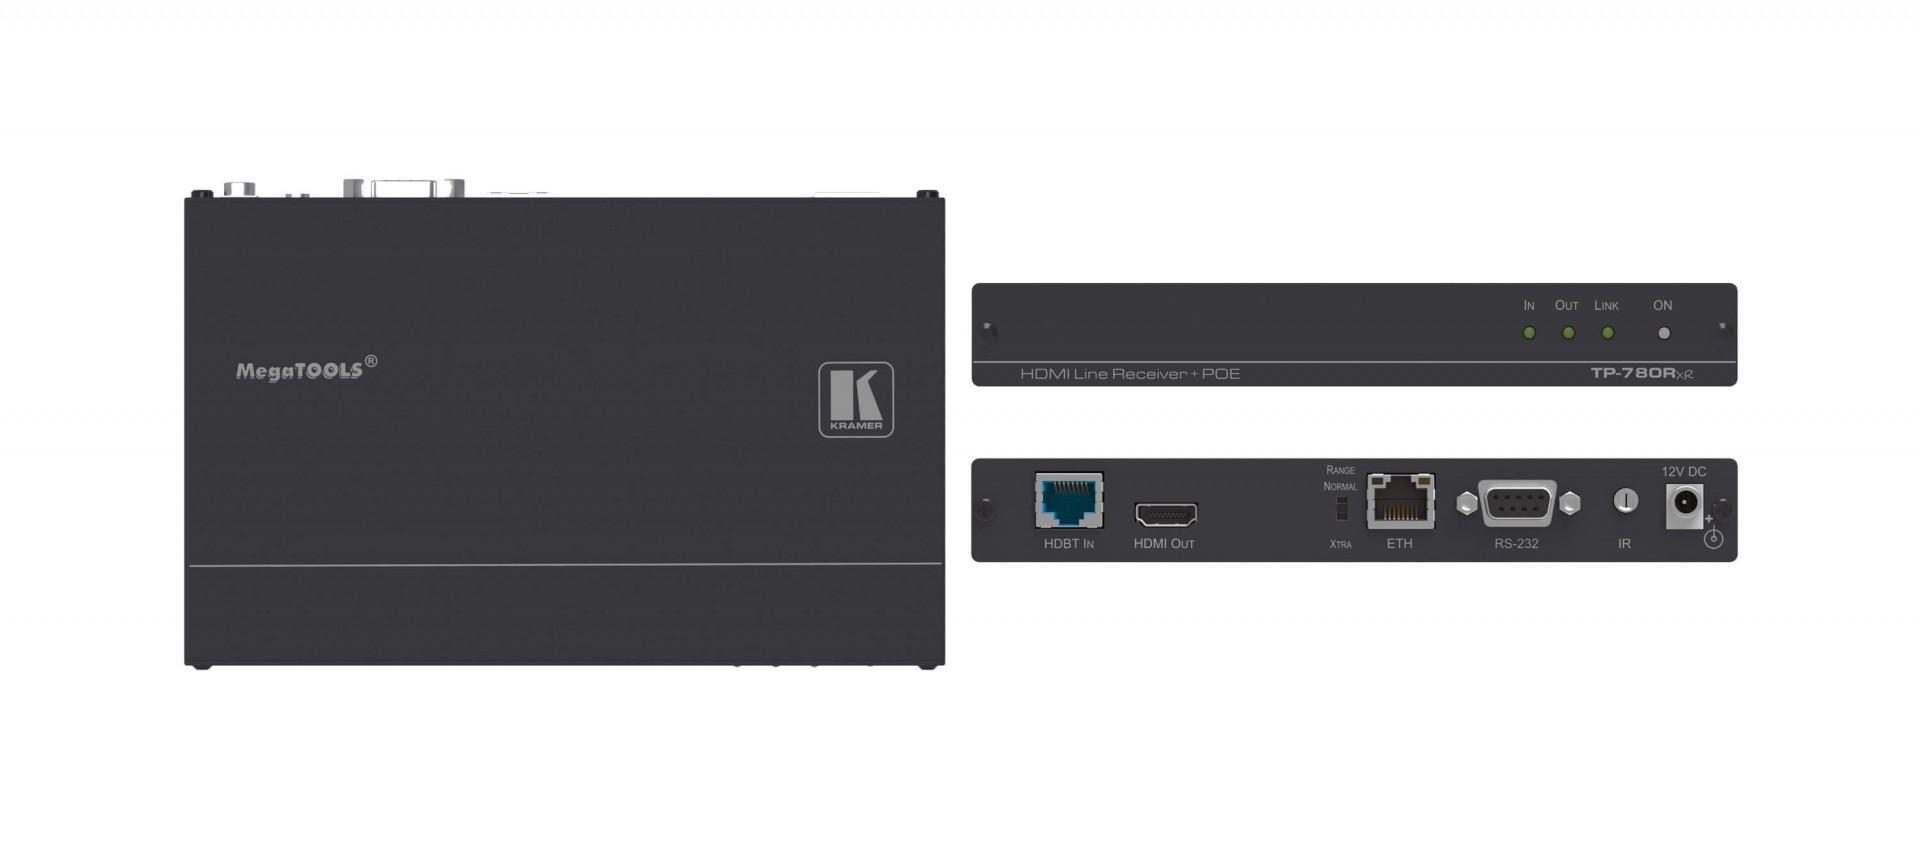 Kramer TP-780Rxr - 4K60 4:2:0 HDMI HDCP 2.2 PoE Receiver